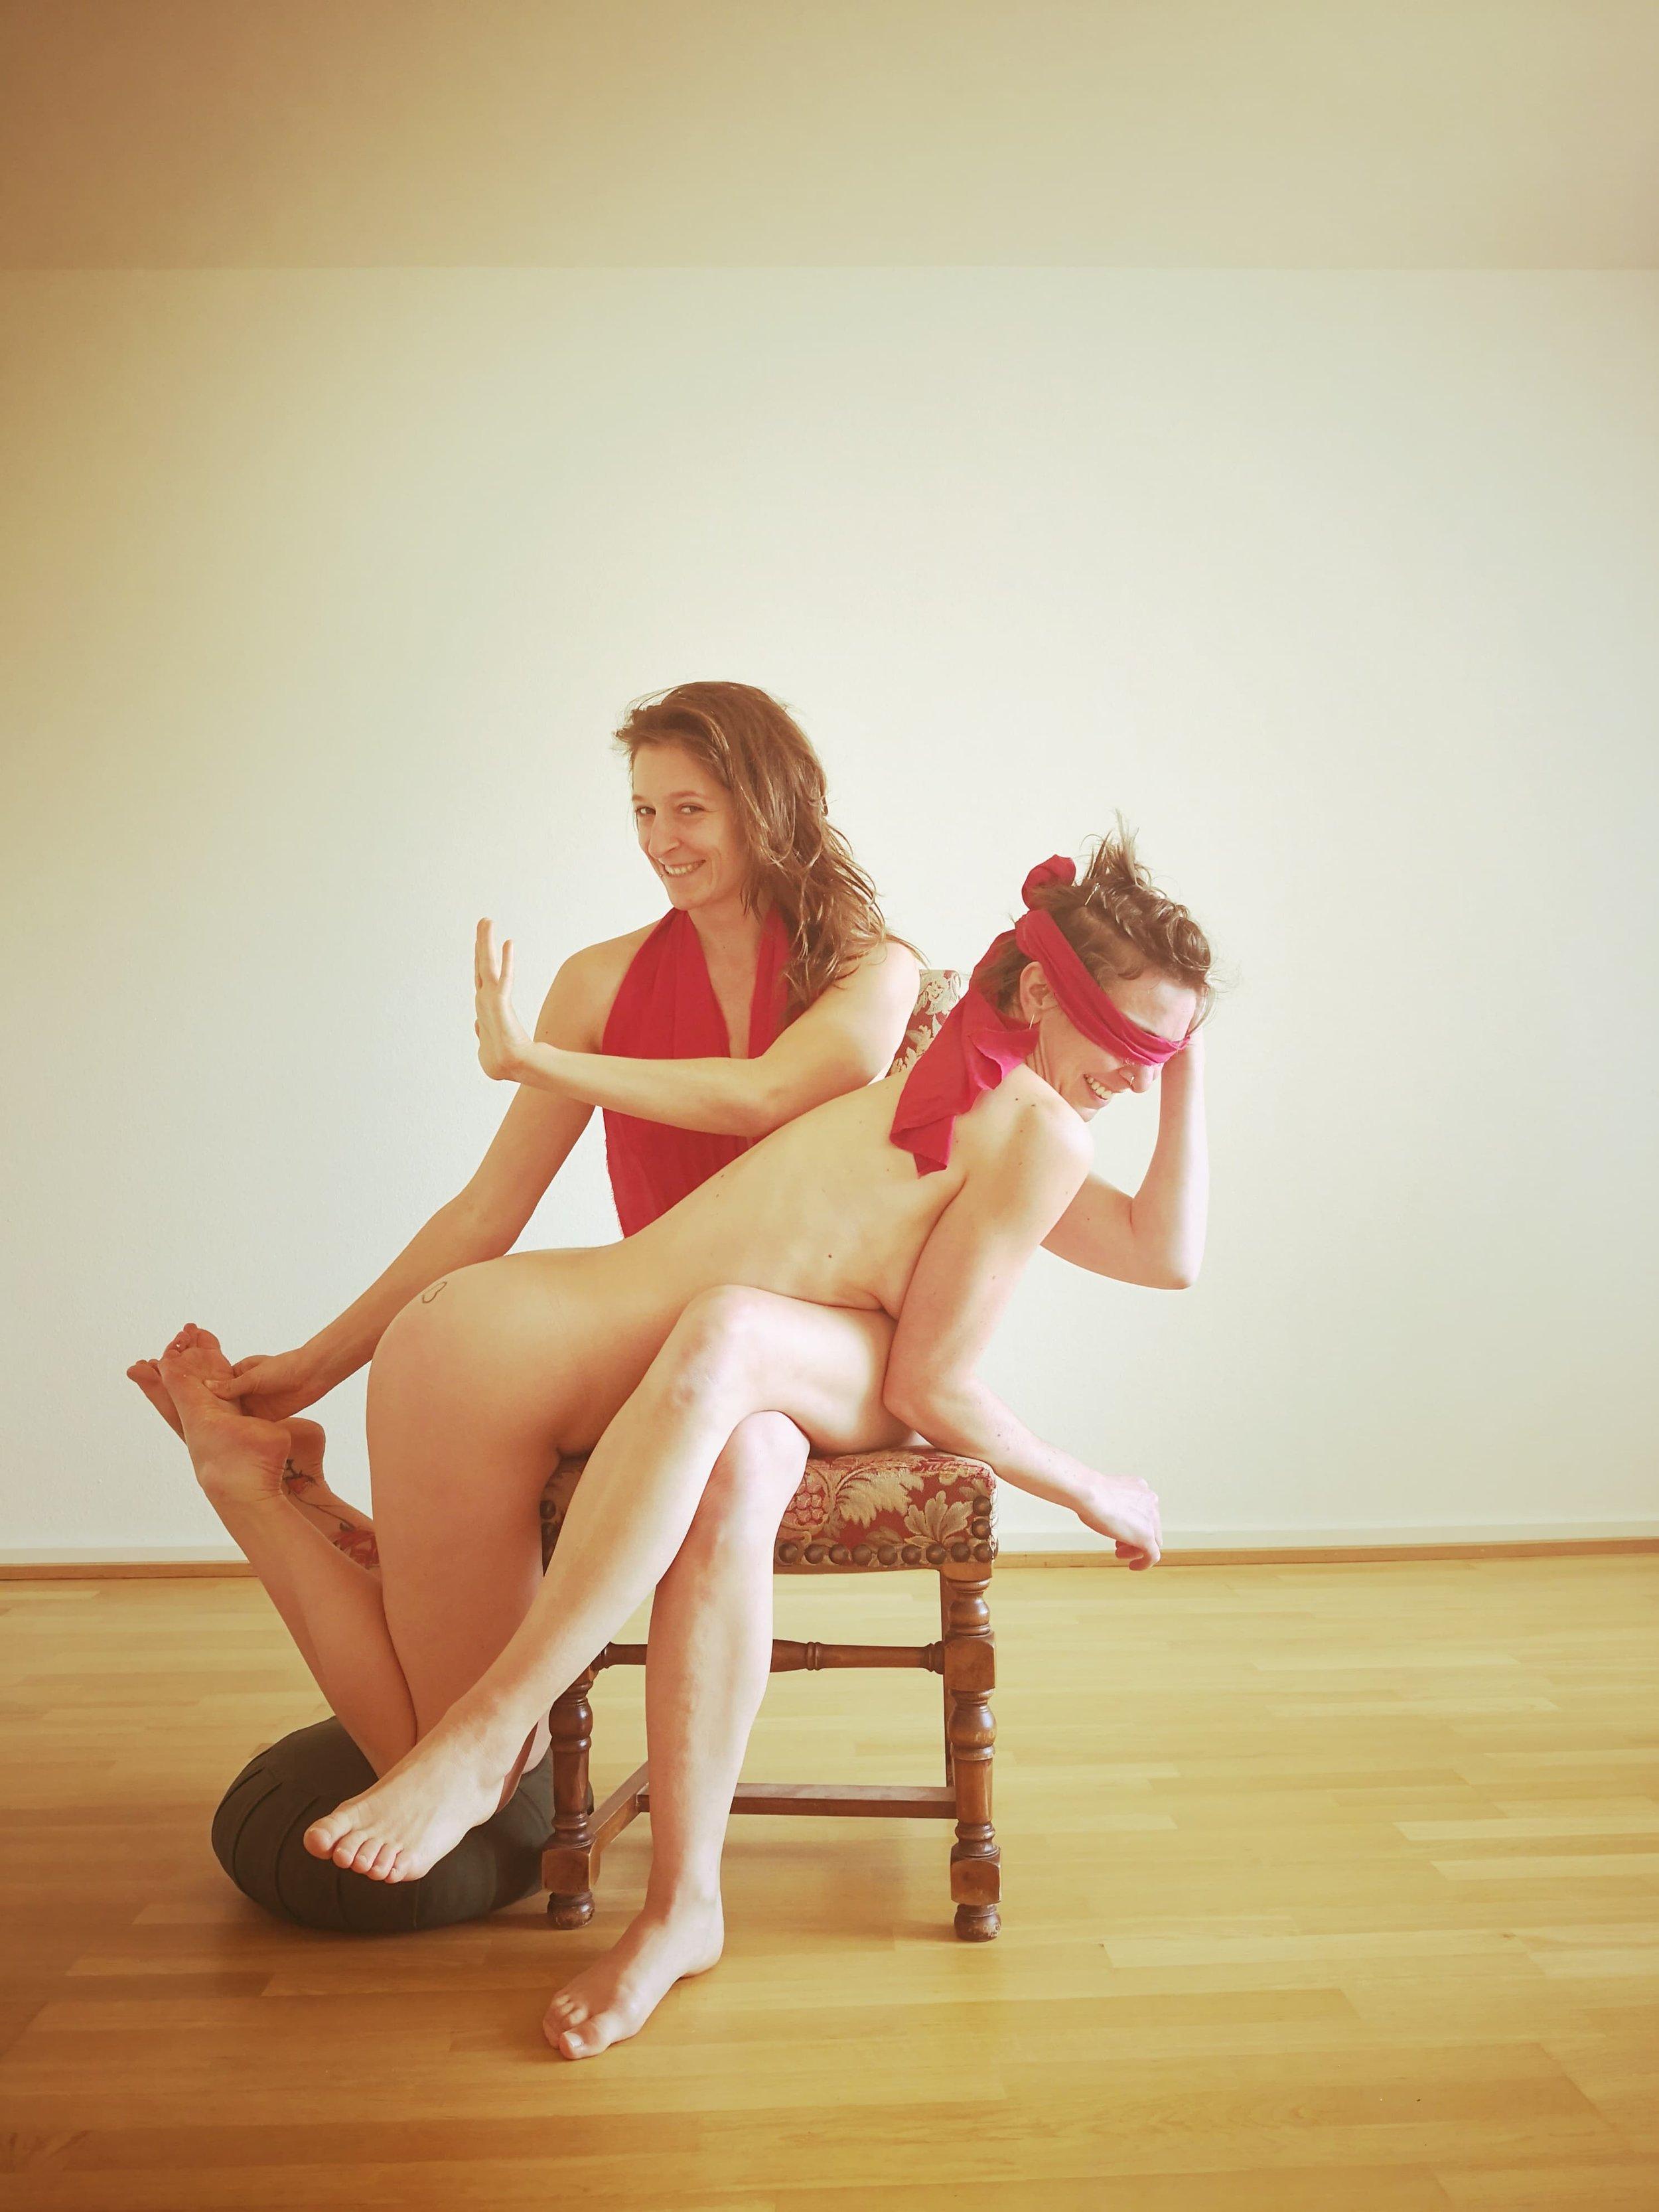 Kinky Wellbeing Massage - August 31st 2019, Basel - Switzerland10am - 6pm